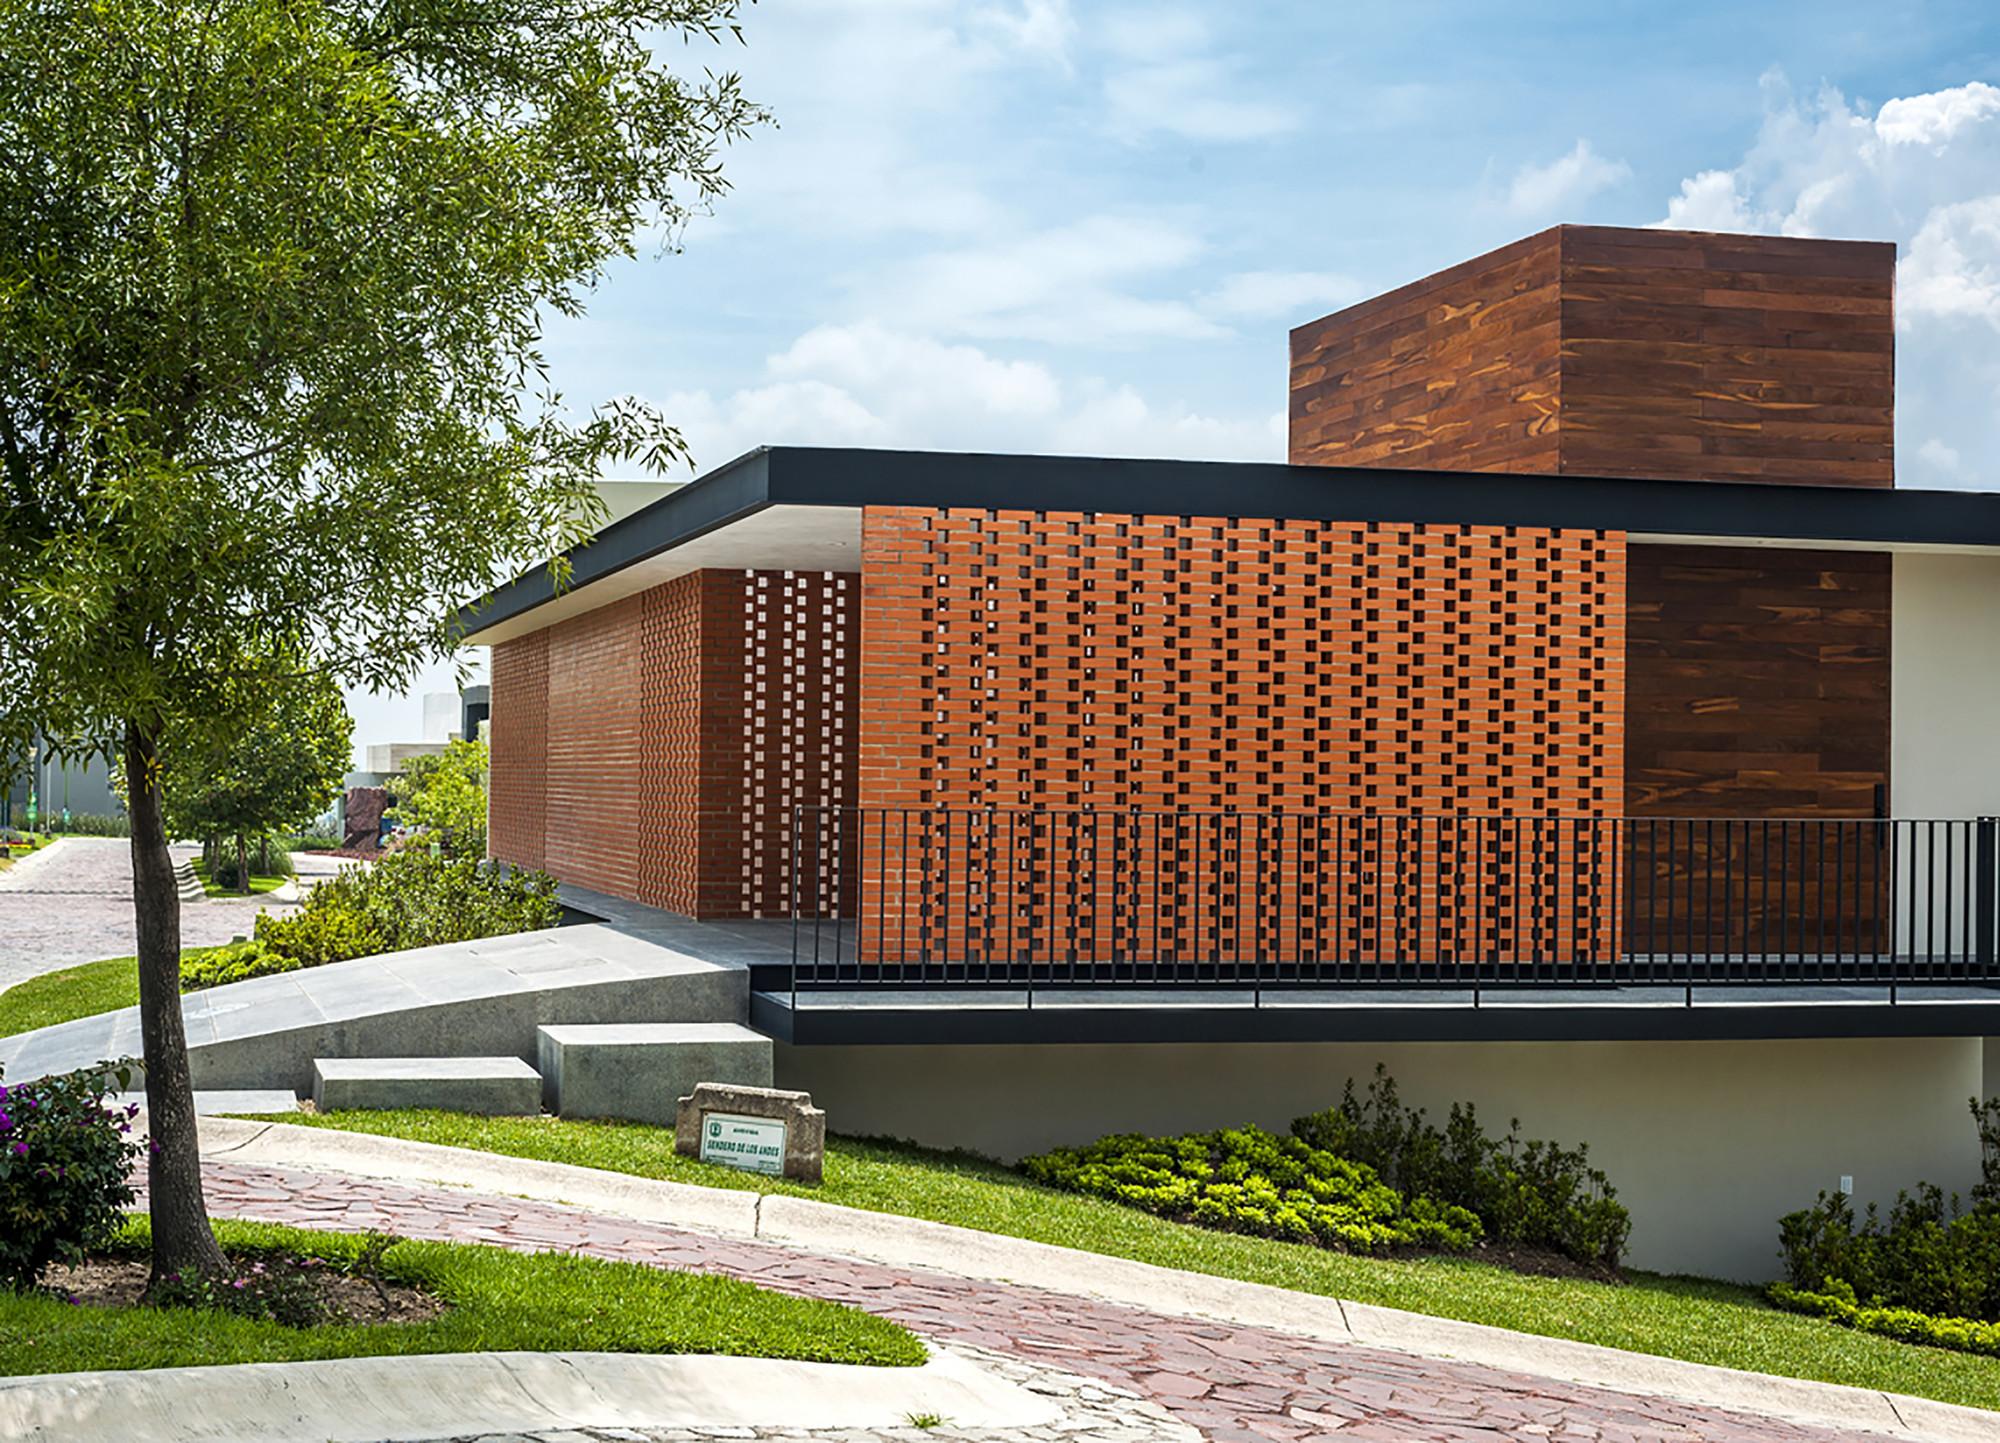 Galeria de casa ro alexanderson arquitectos 6 for Casa de arquitectos